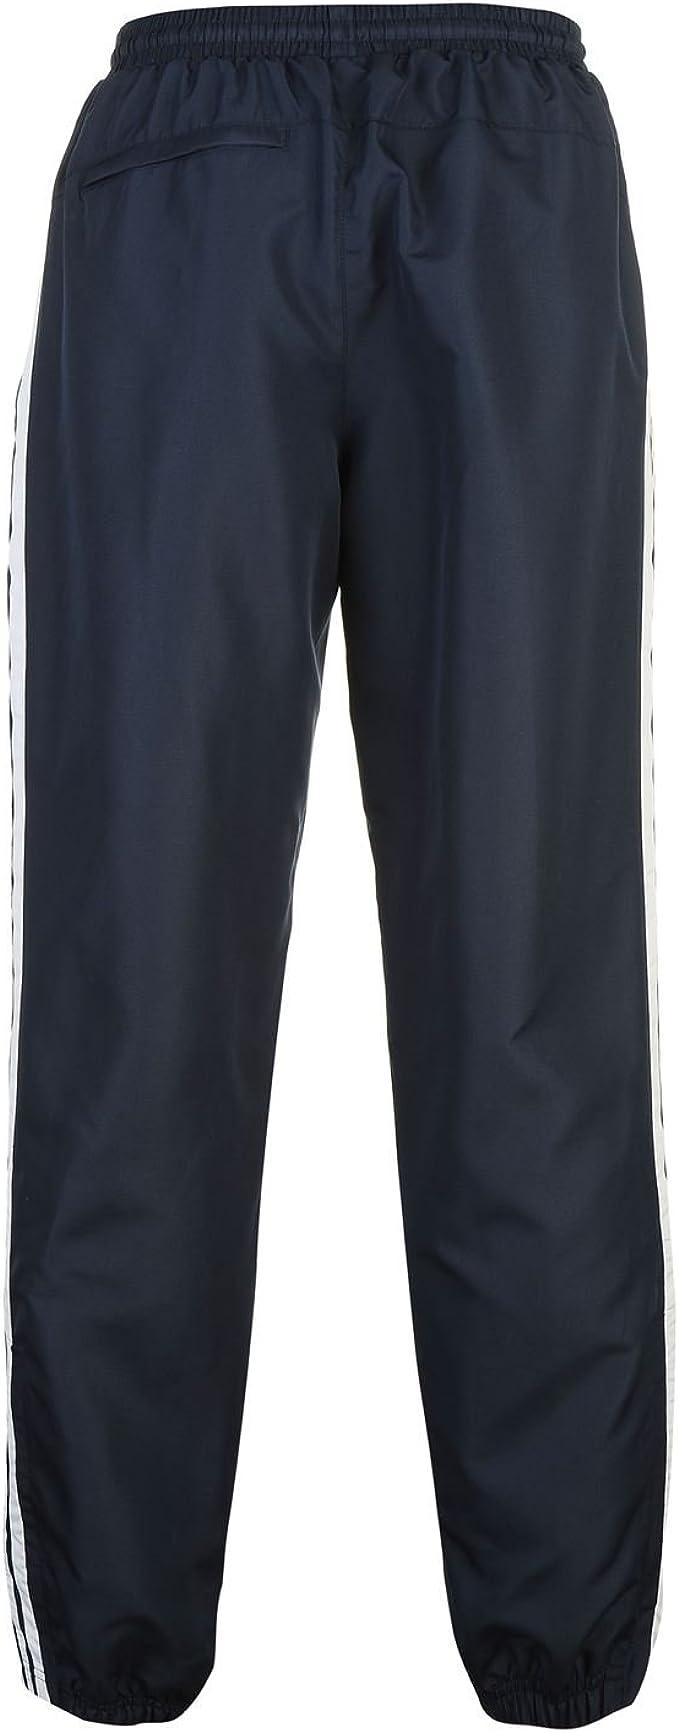 Lonsdale Hombre 2 Stripe Pantalones Deportivos De Chándal: Amazon ...